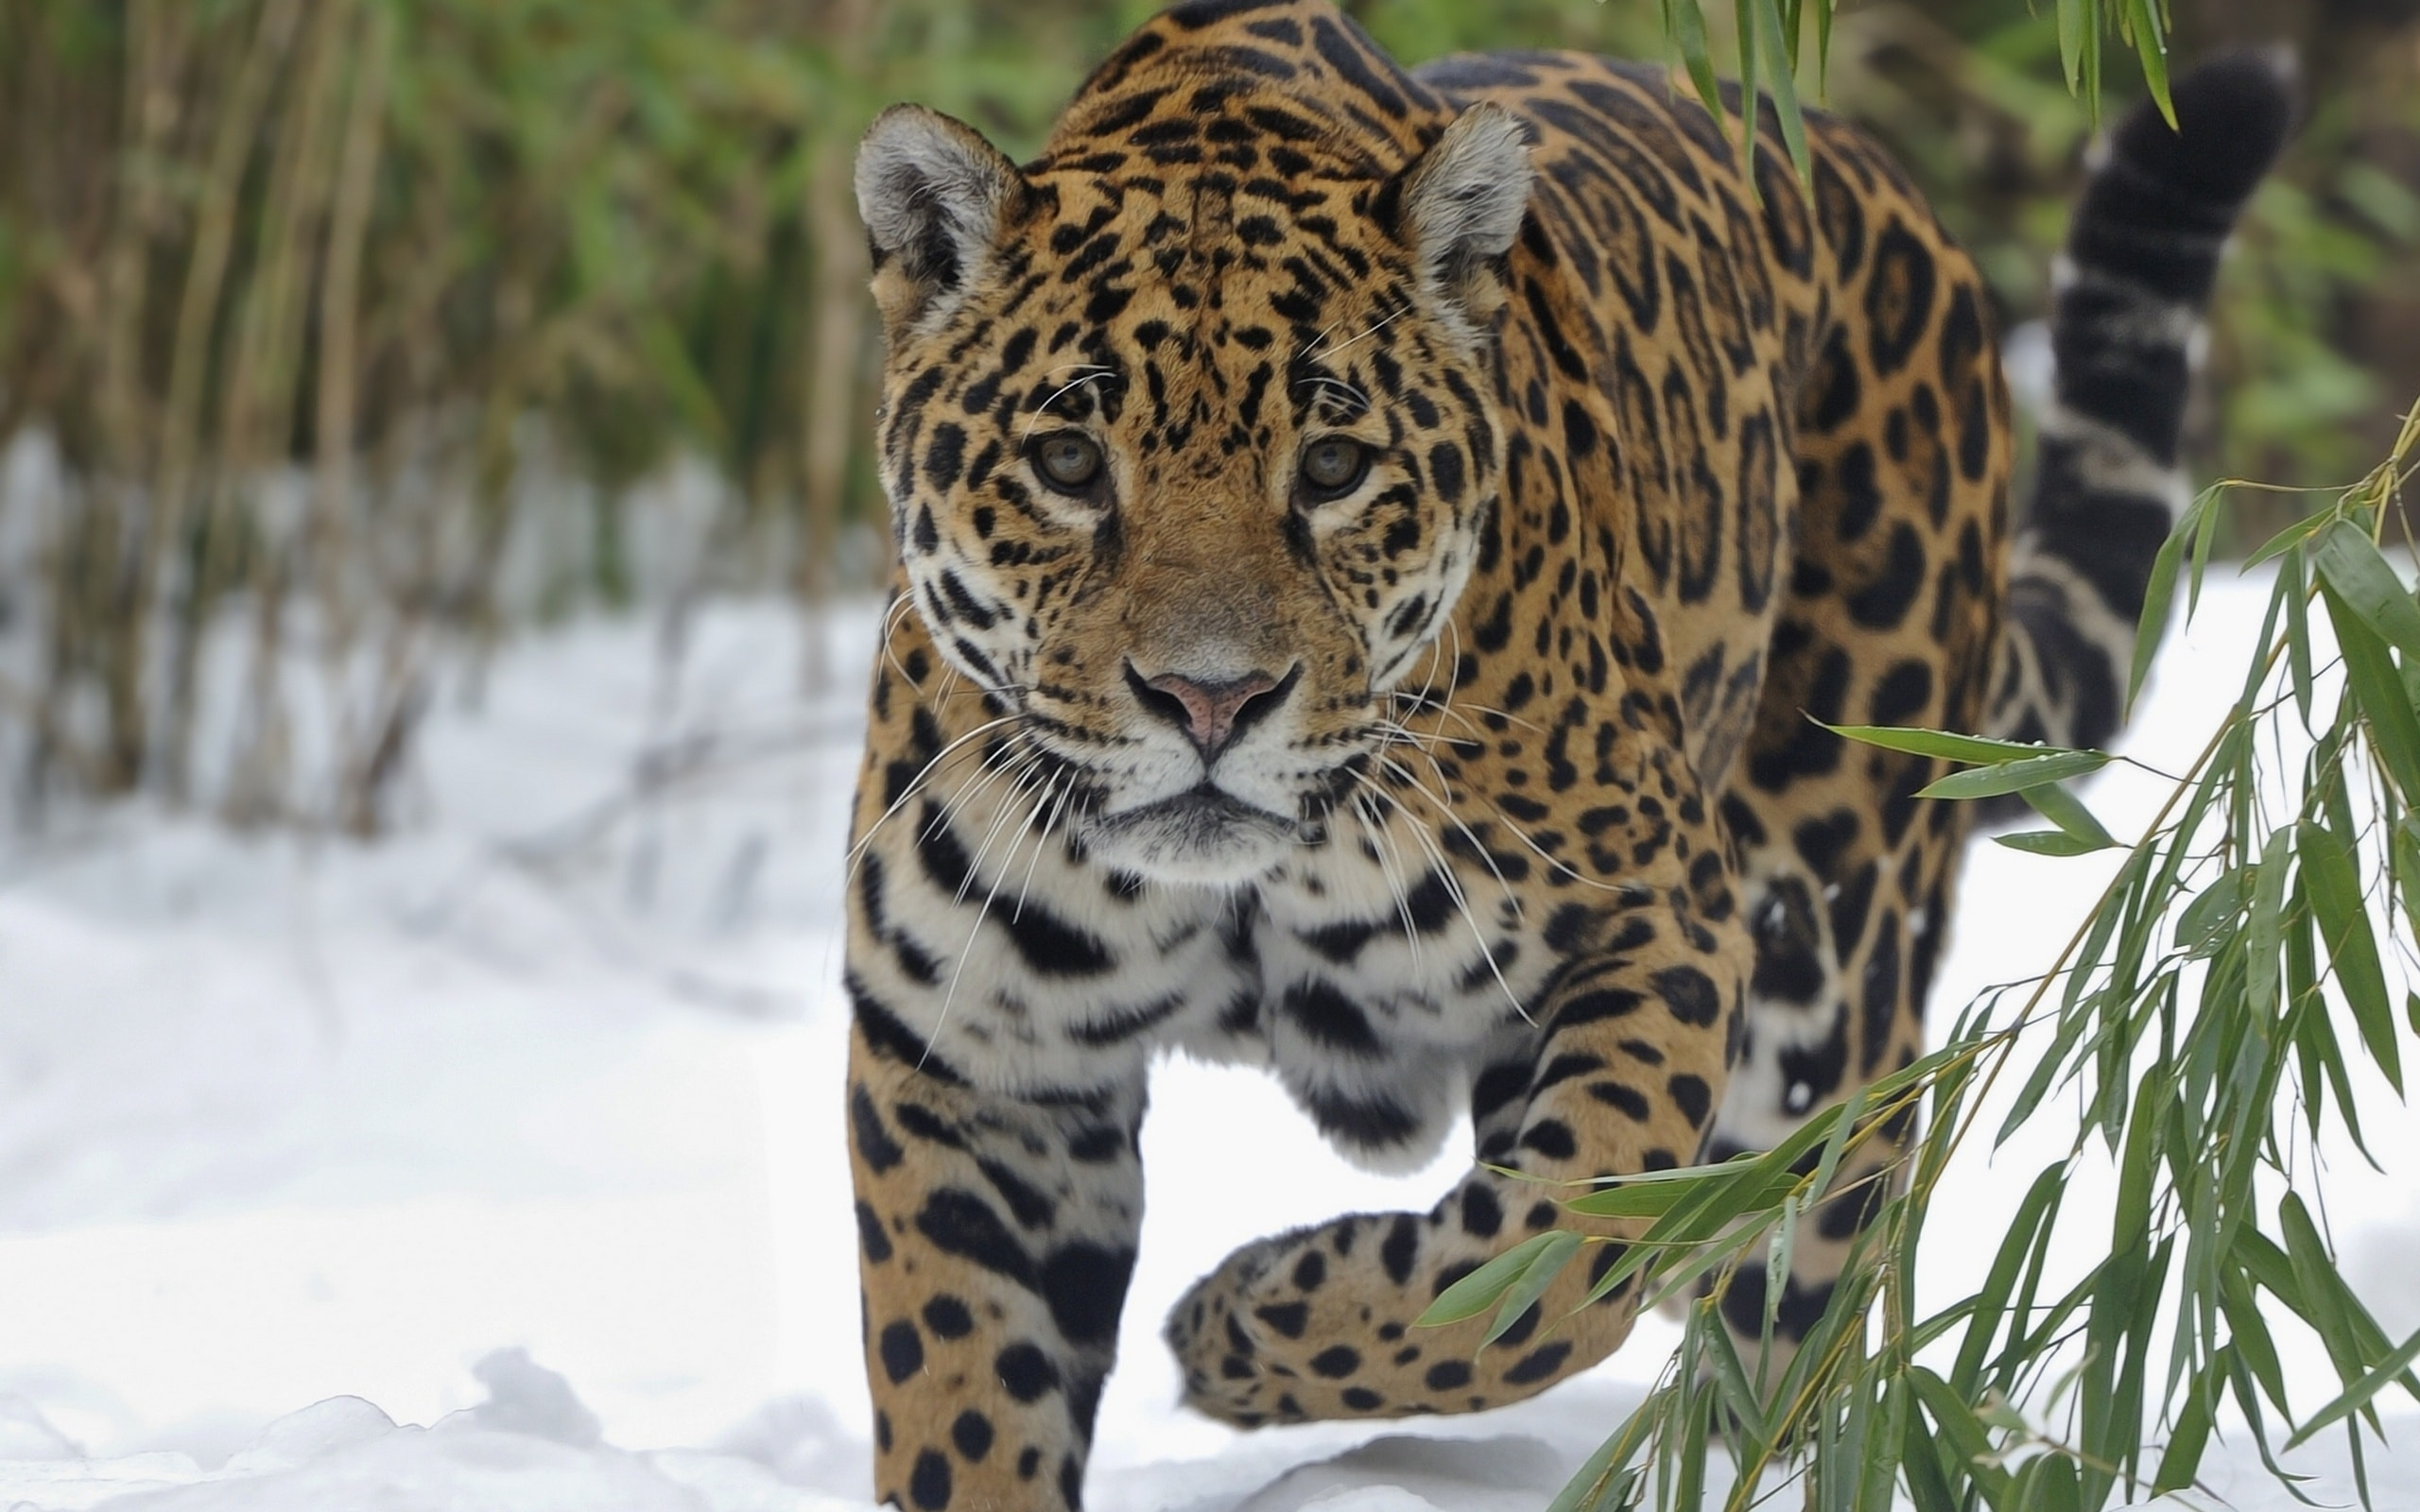 Jaguar widescreen for desktop